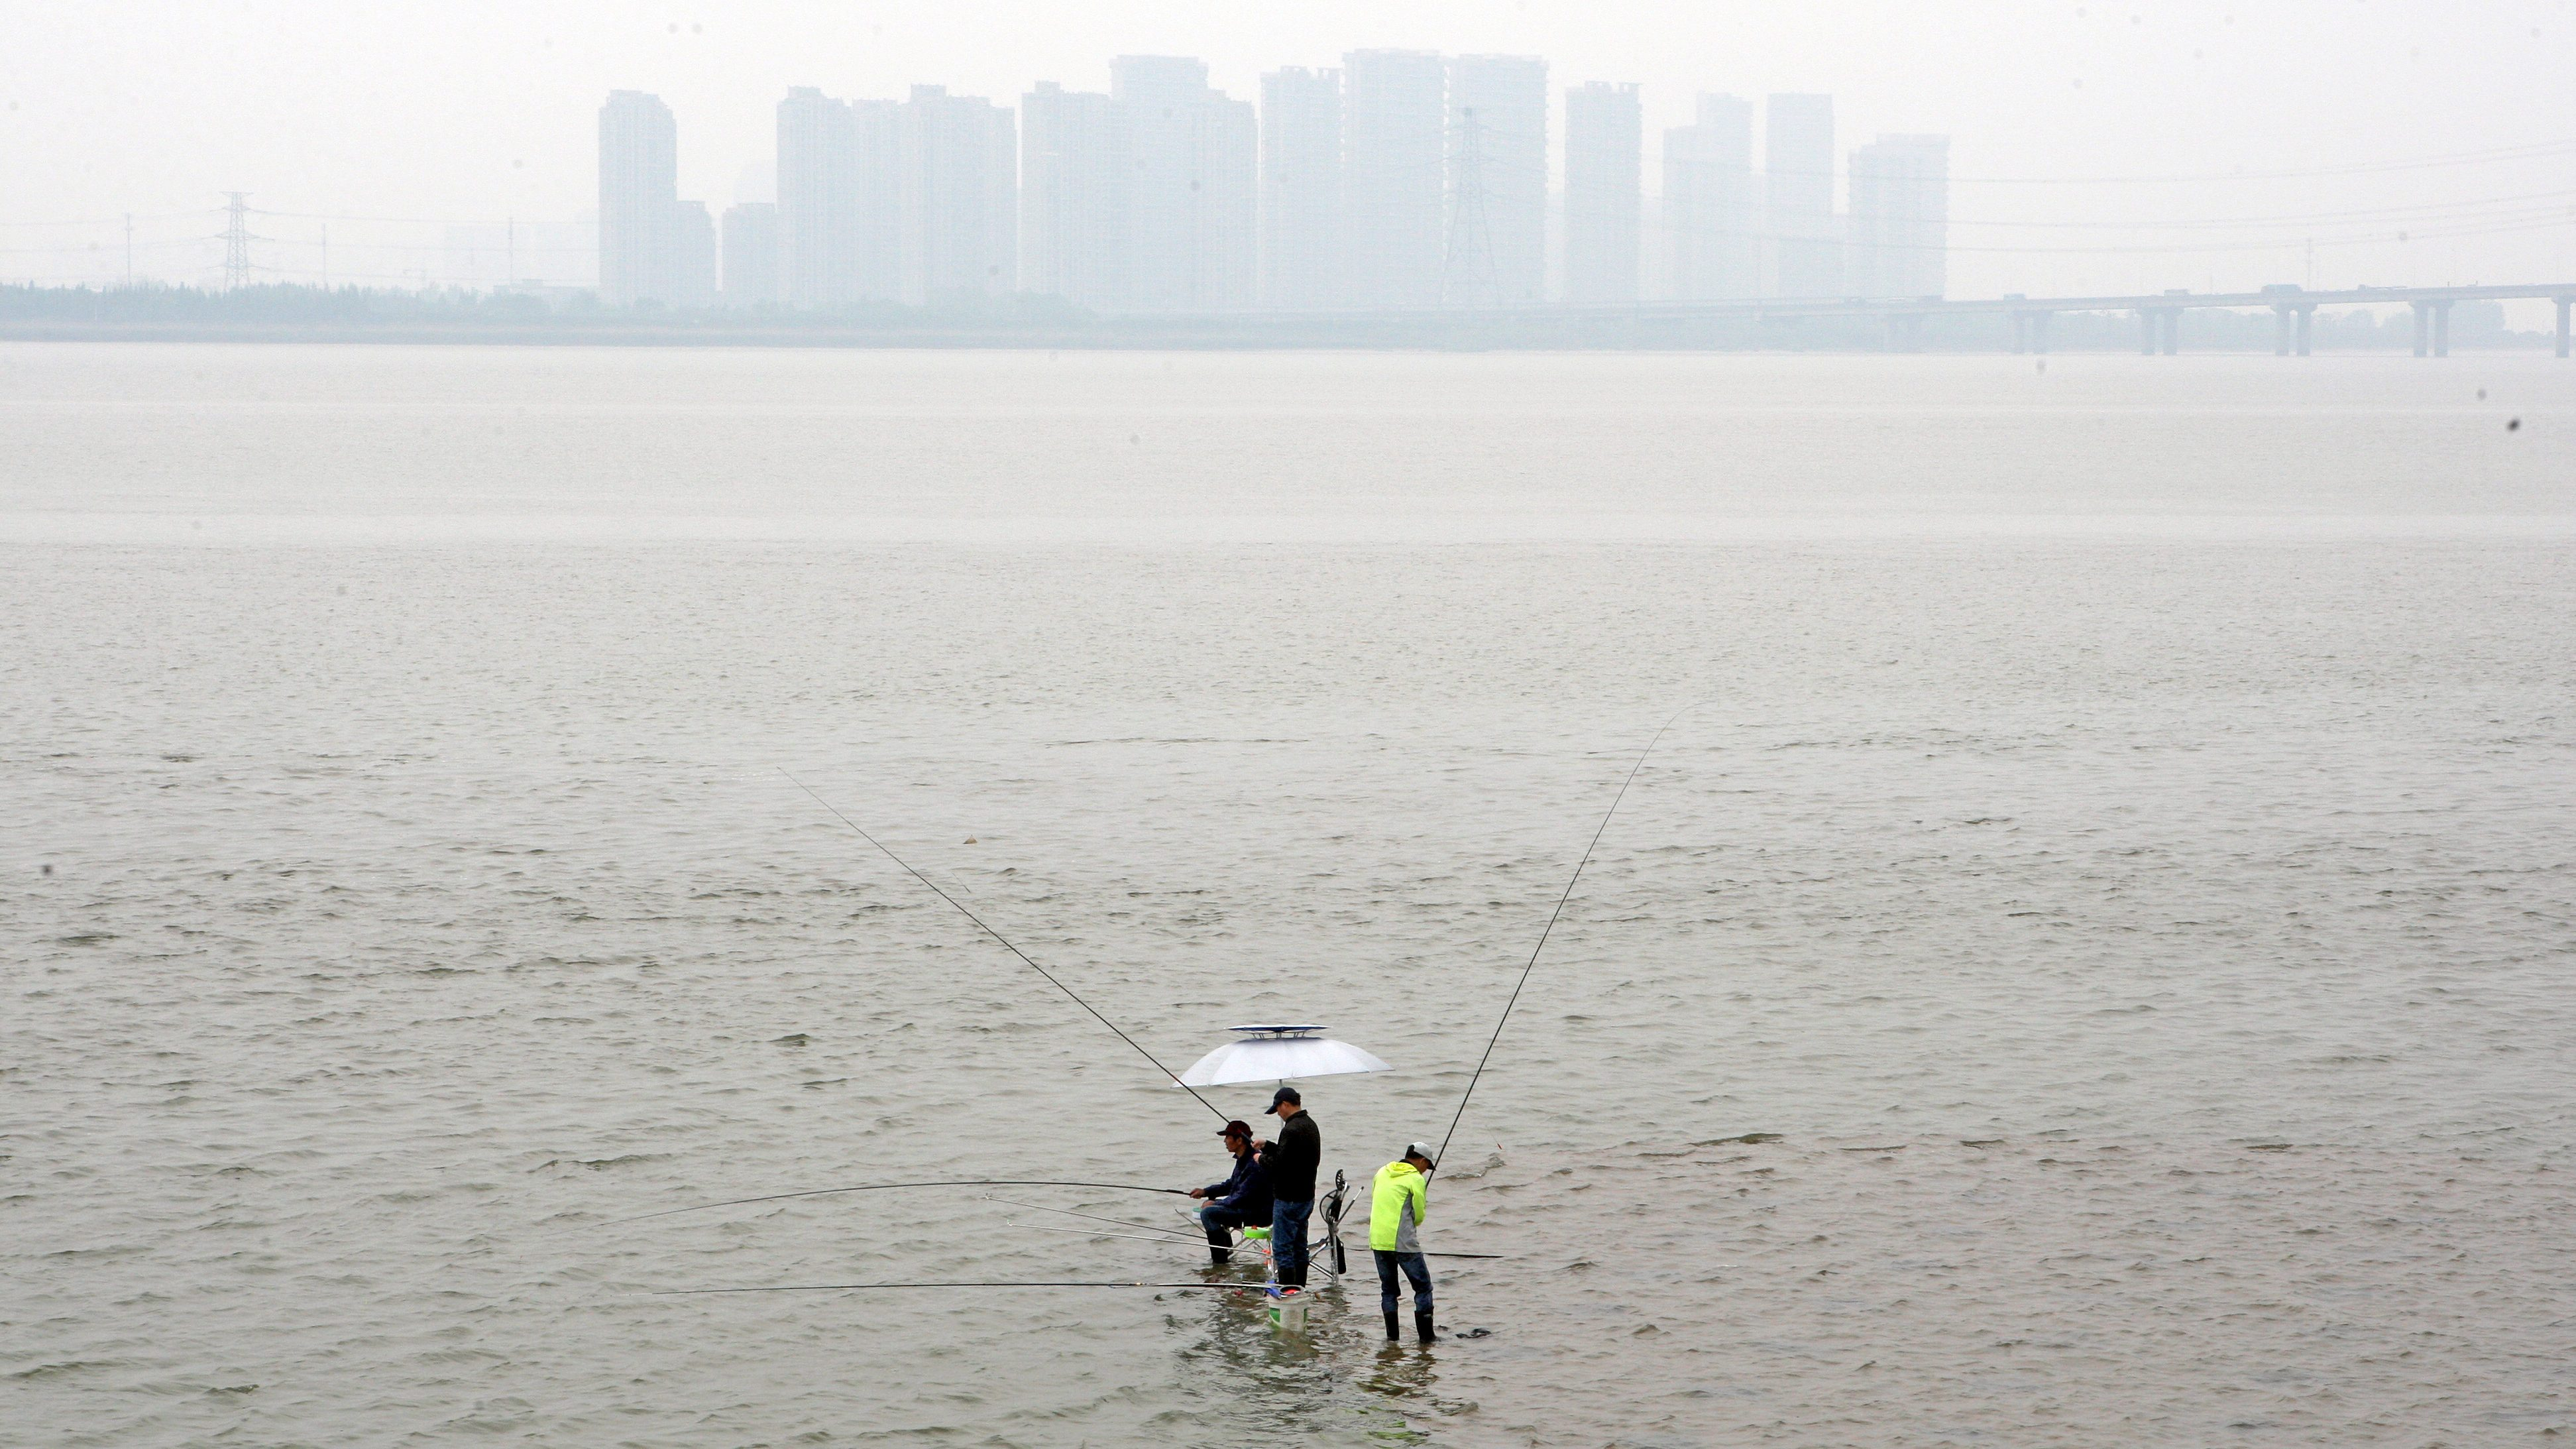 People fish on the Qiantang River in Hangzhou, Zhejiang province, China, April 21, 2017. Picture taken April 21, 2017.